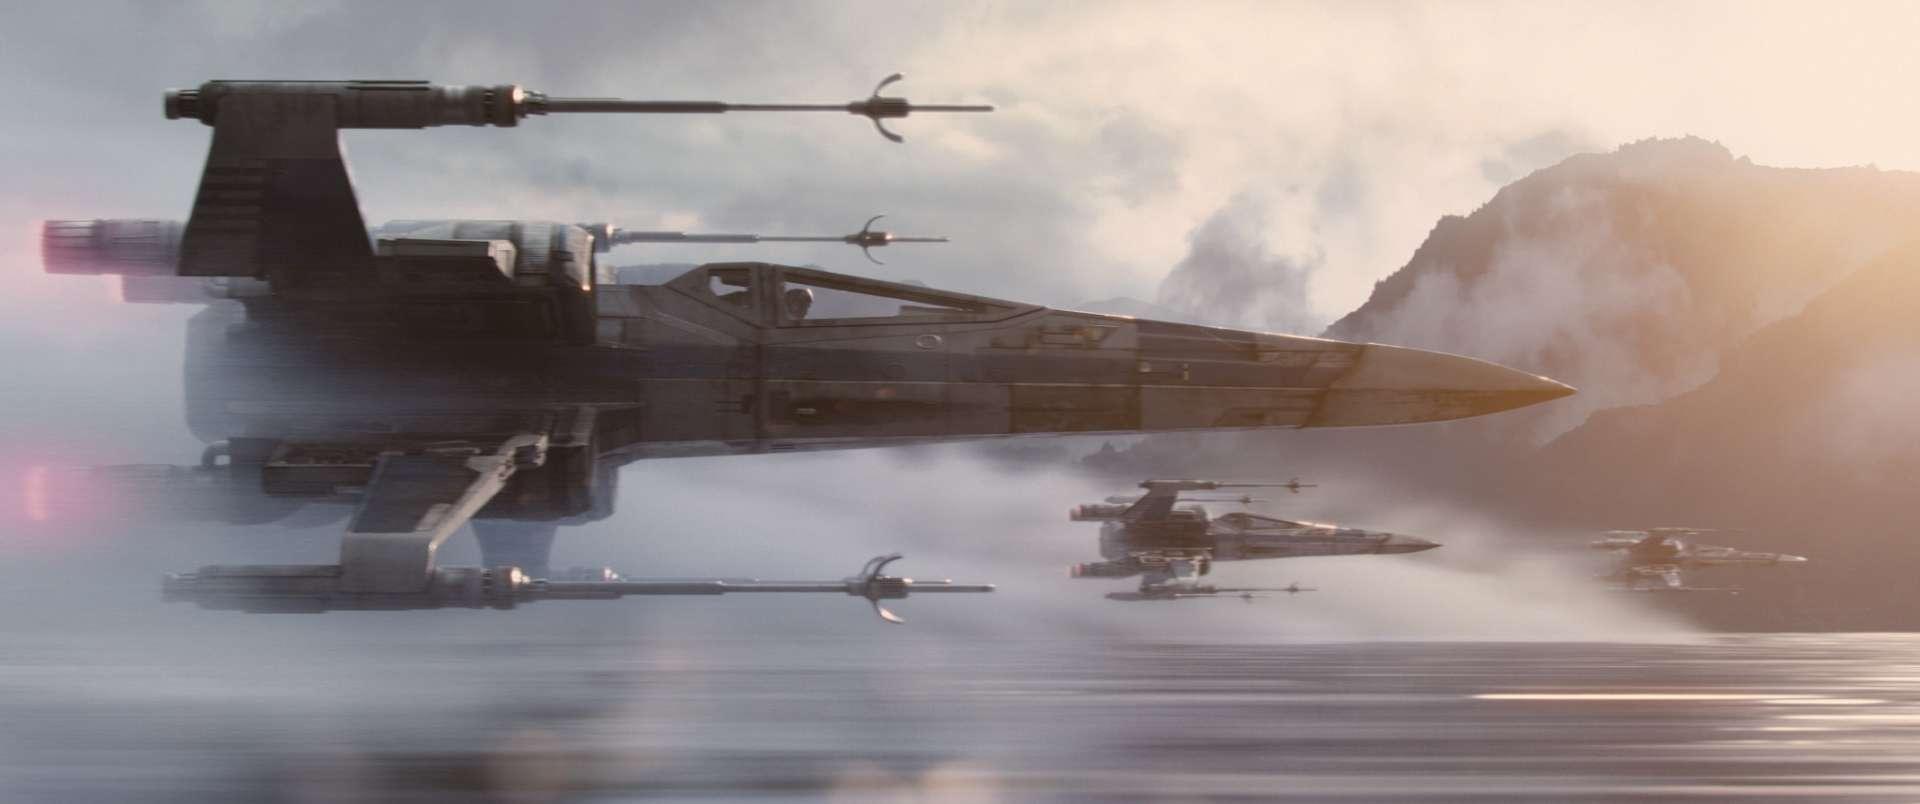 Star Wars Episode VII The Force Awakens Wallpaper 083